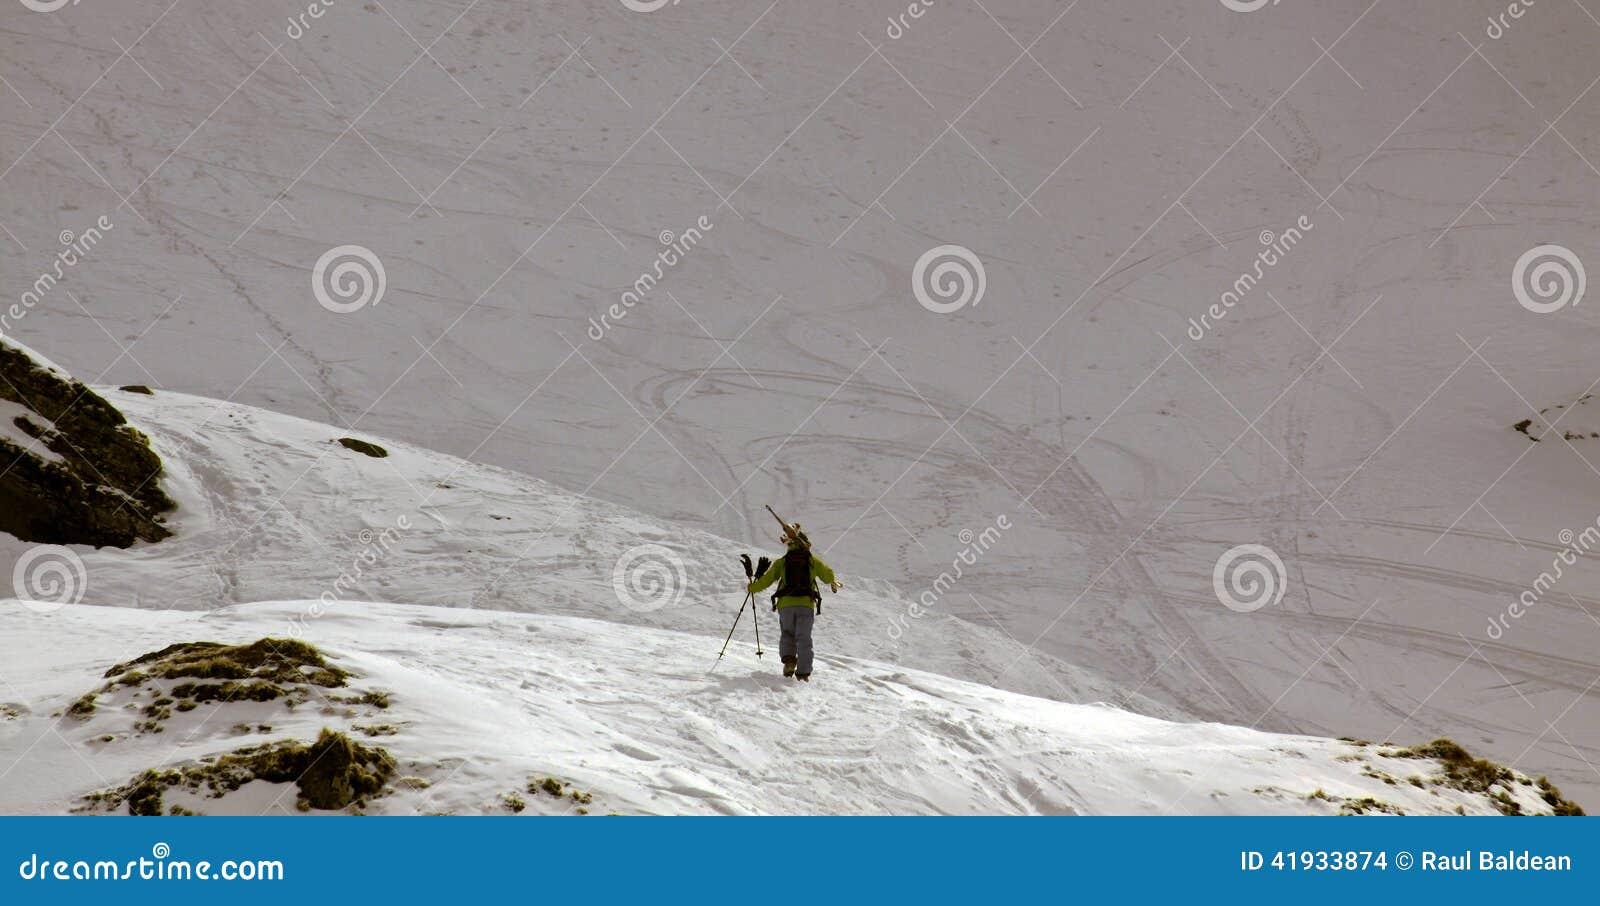 Conquering the mountain